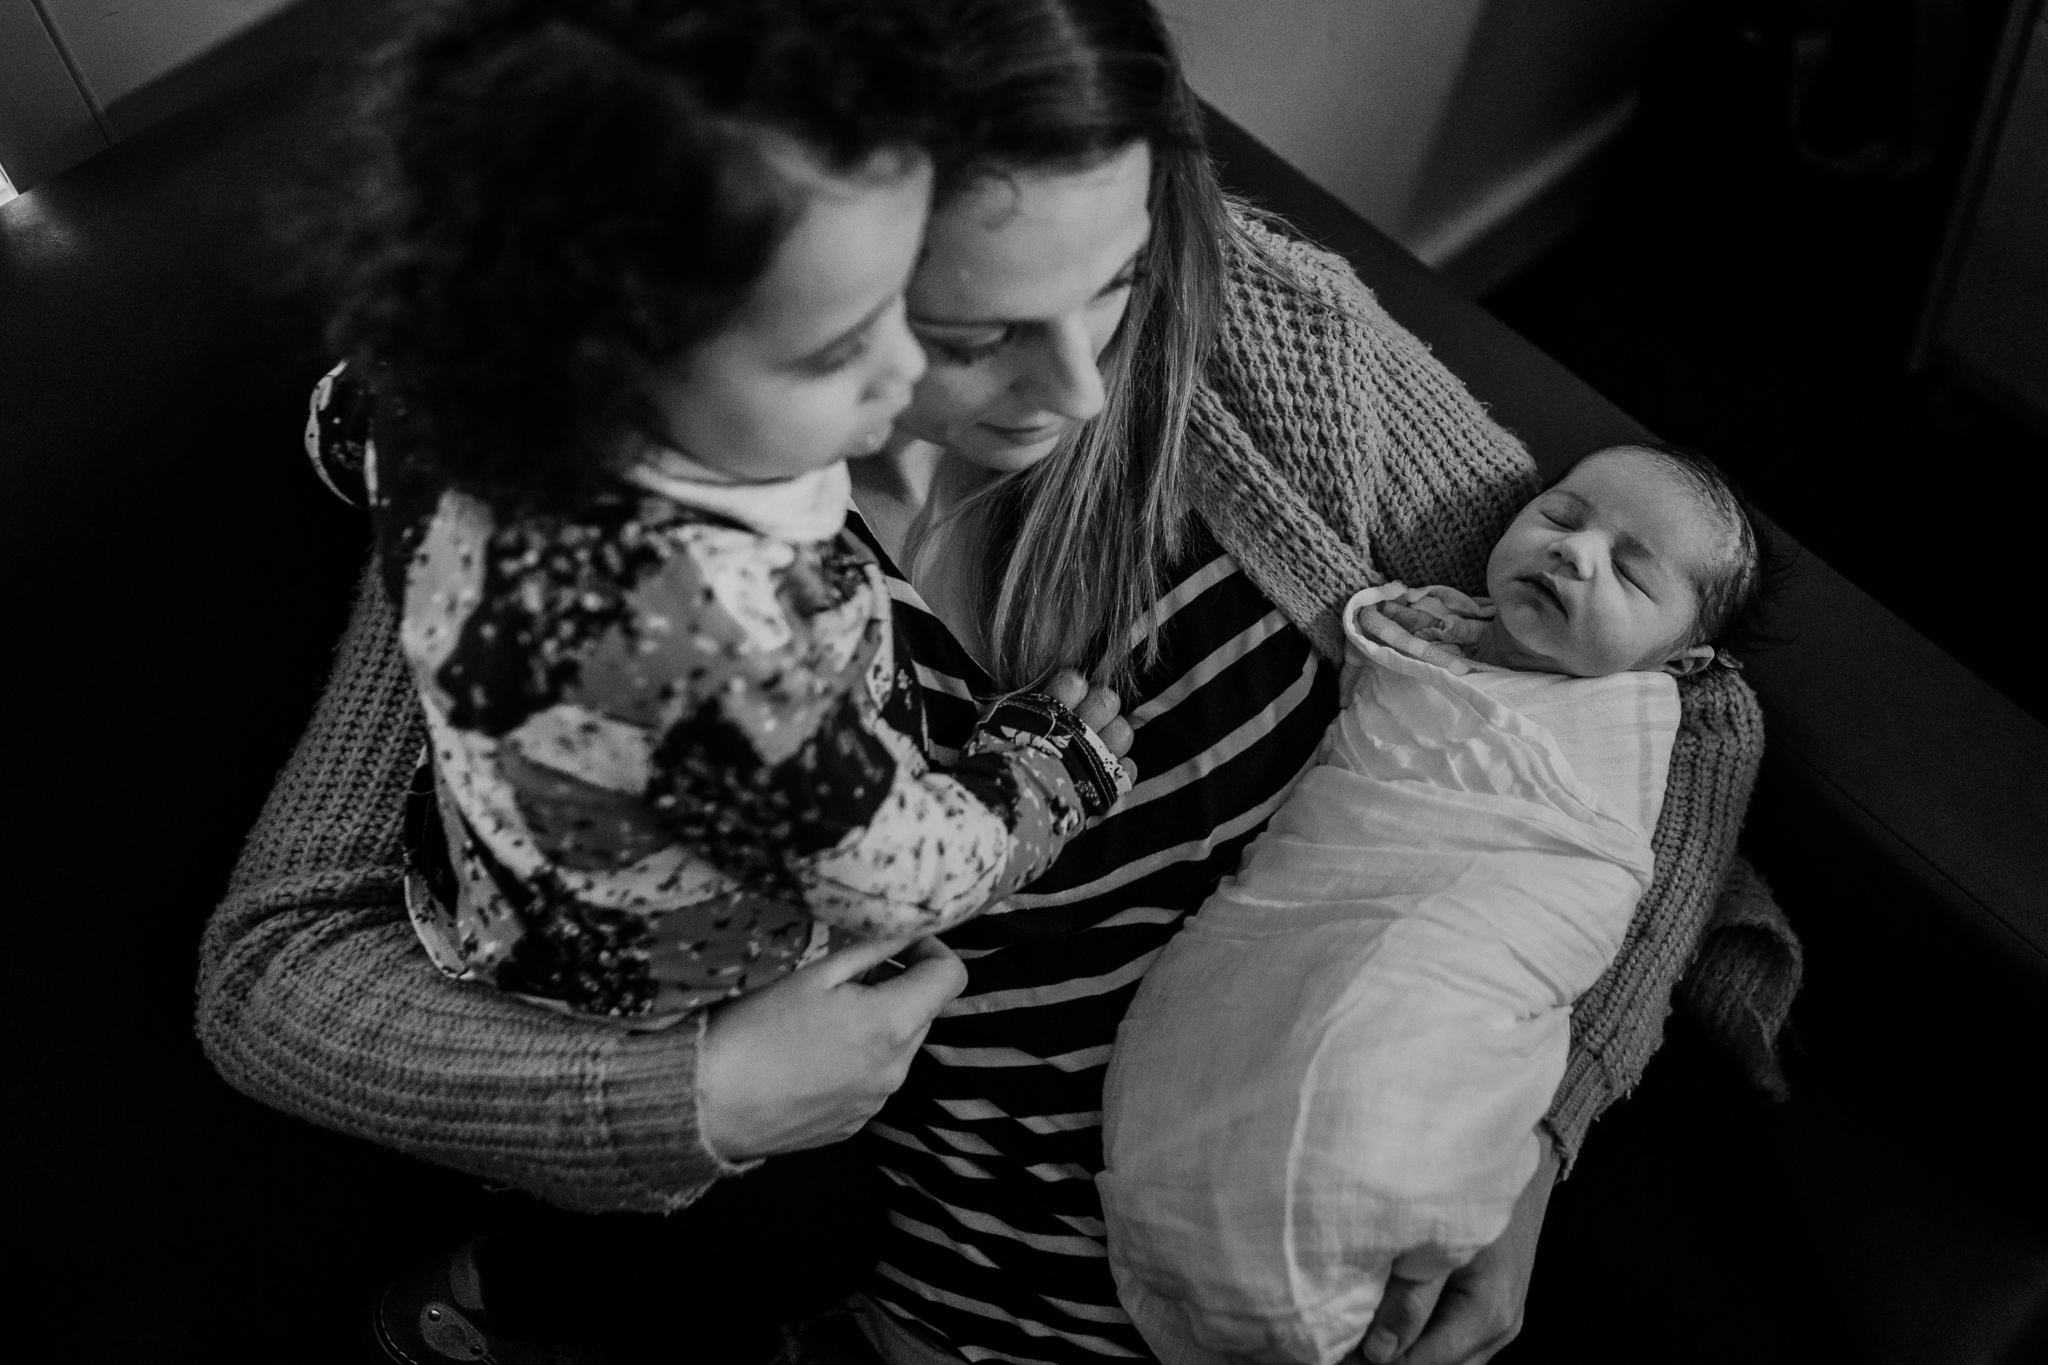 Sydney Newborn Photography by Kylie Purtell - Winter is here-16.jpg